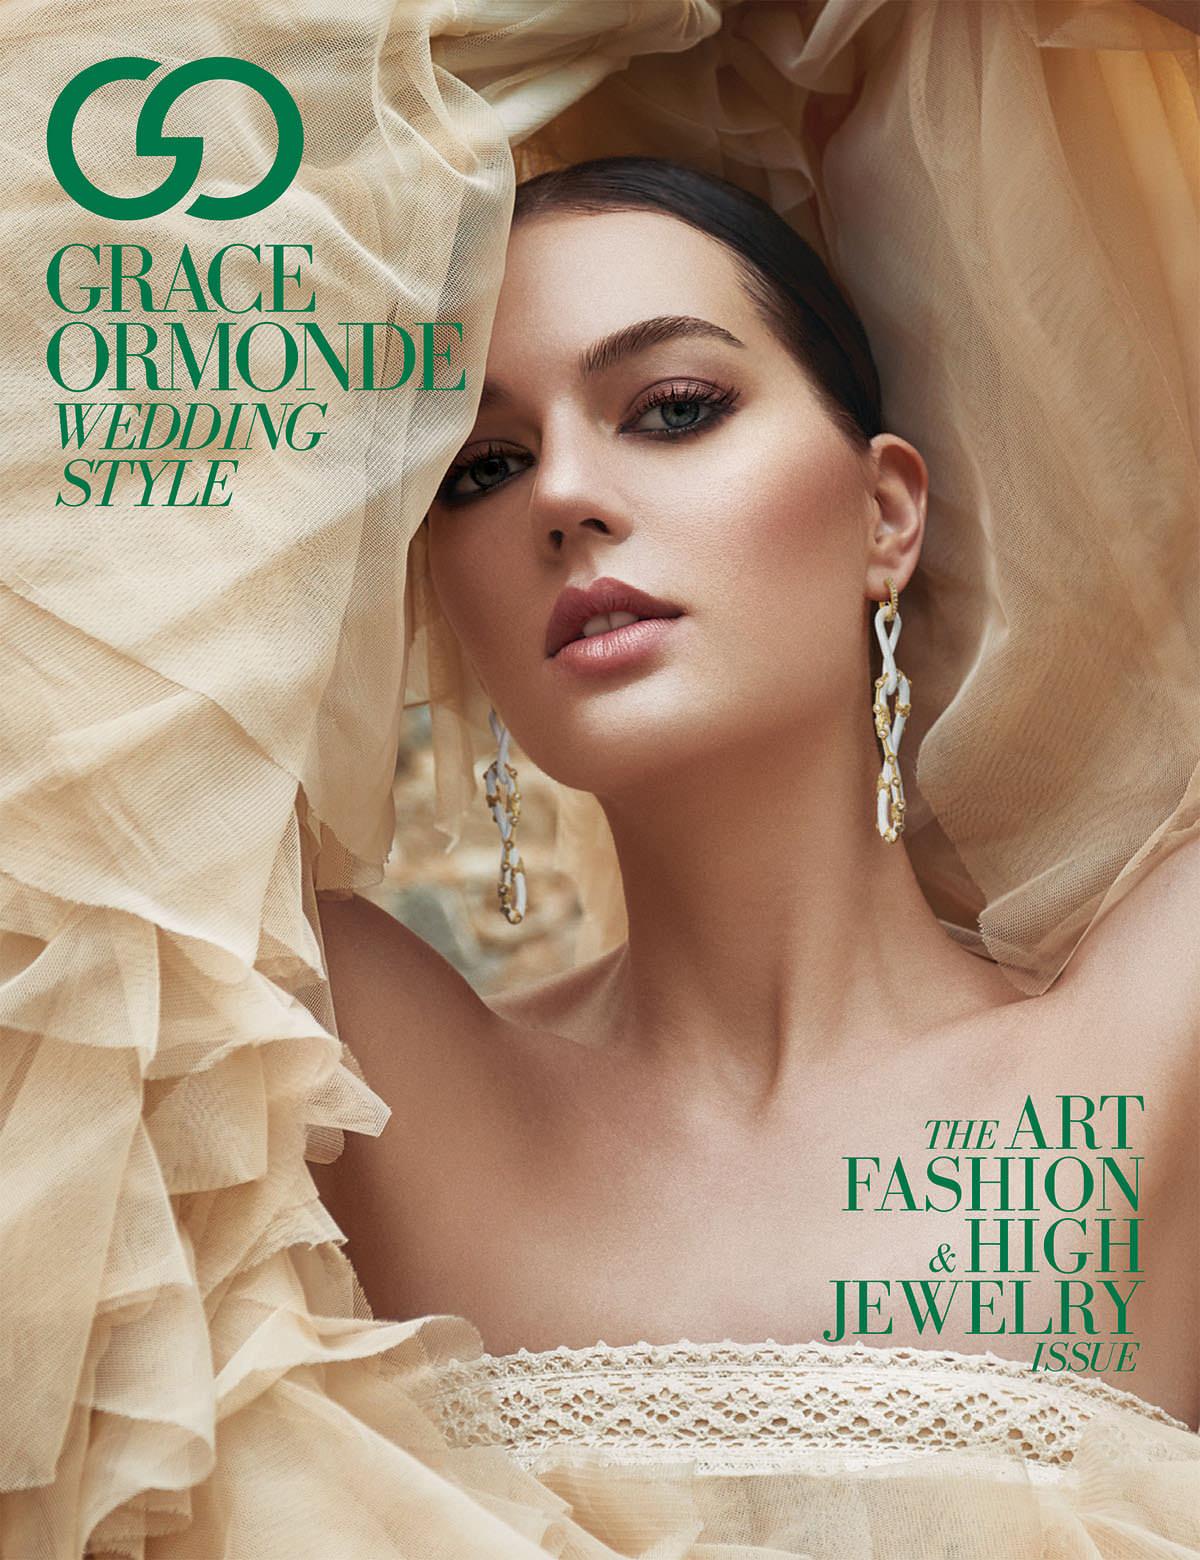 grace-ormonde-cover_SS_2019.jpg